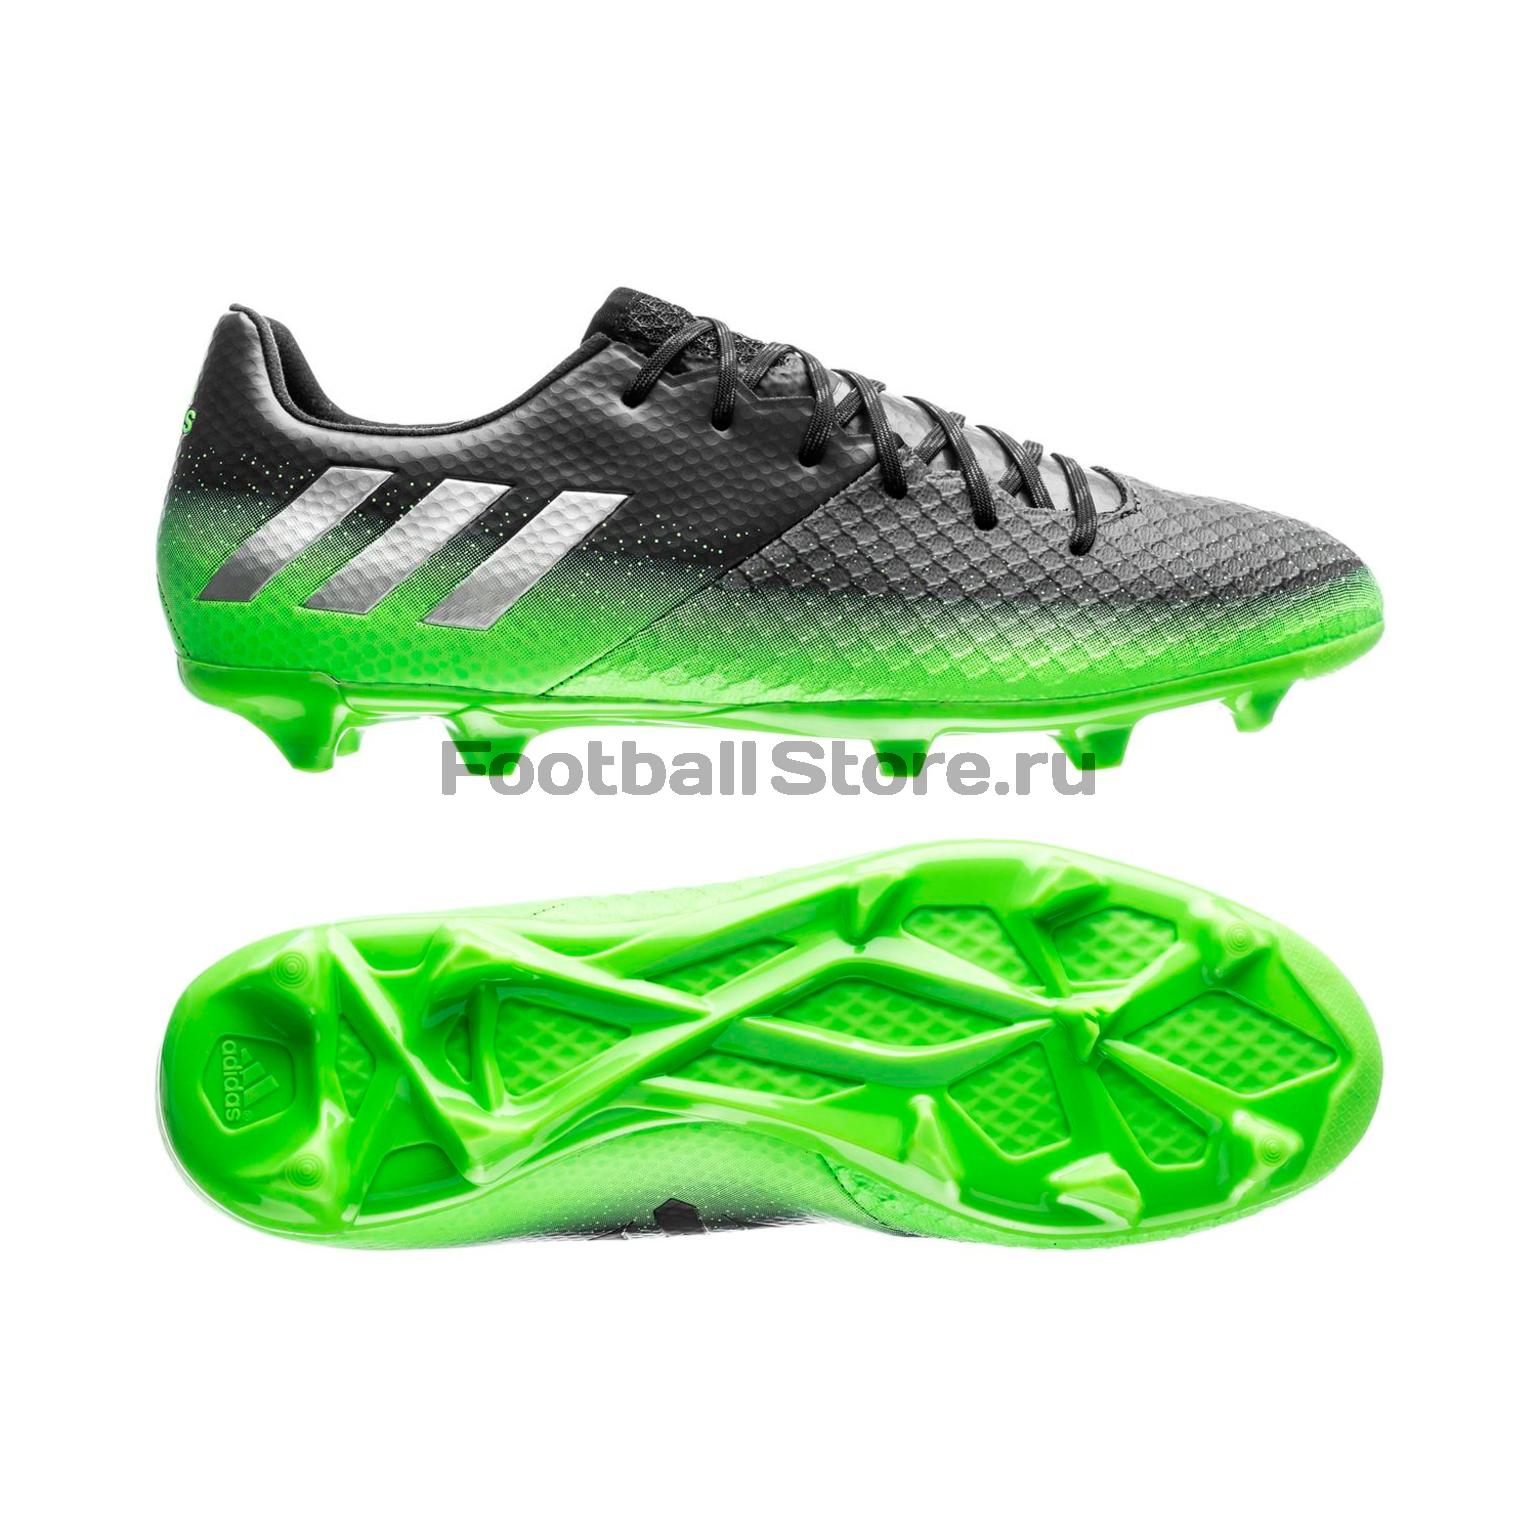 Игровые бутсы Adidas Бутсы Adidas Messi 16.2 FG S79630